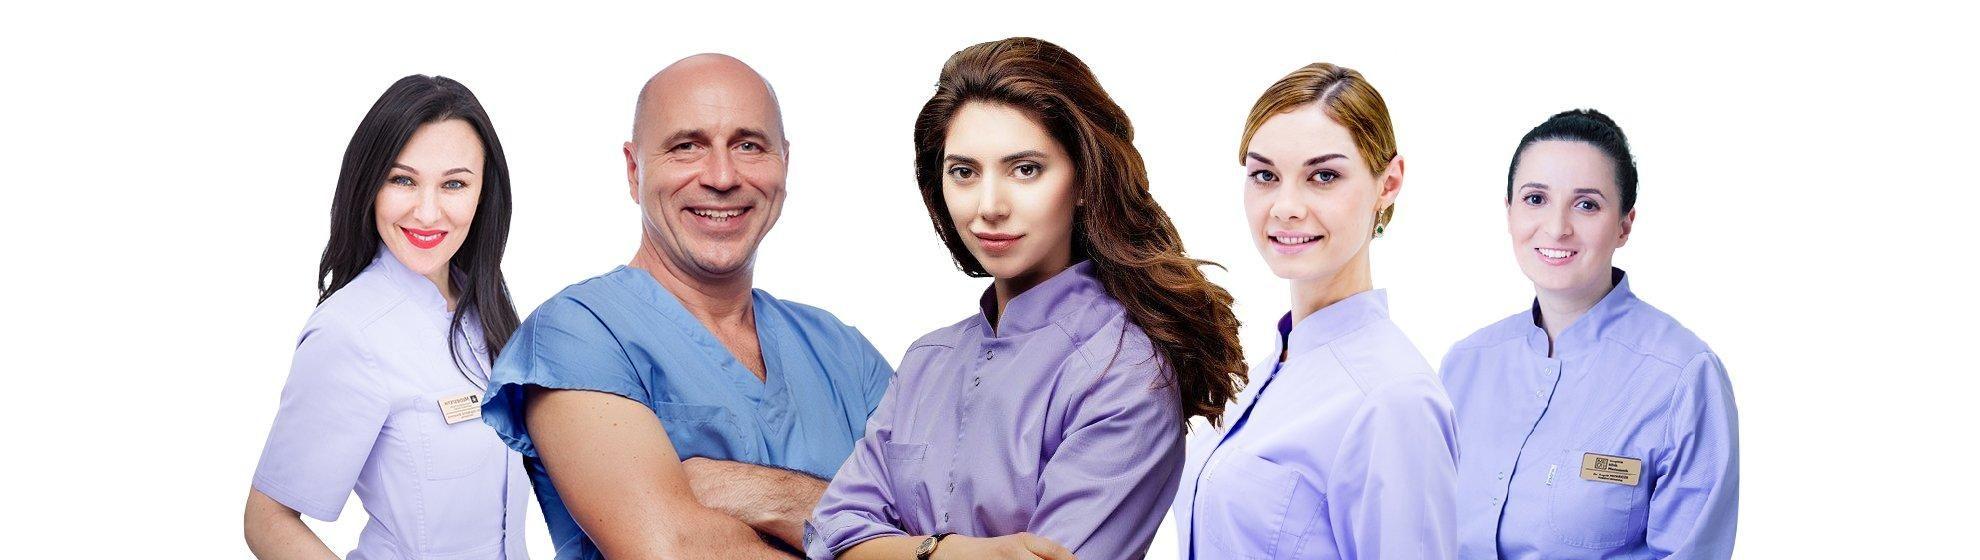 Mediestetik, skupina klinik